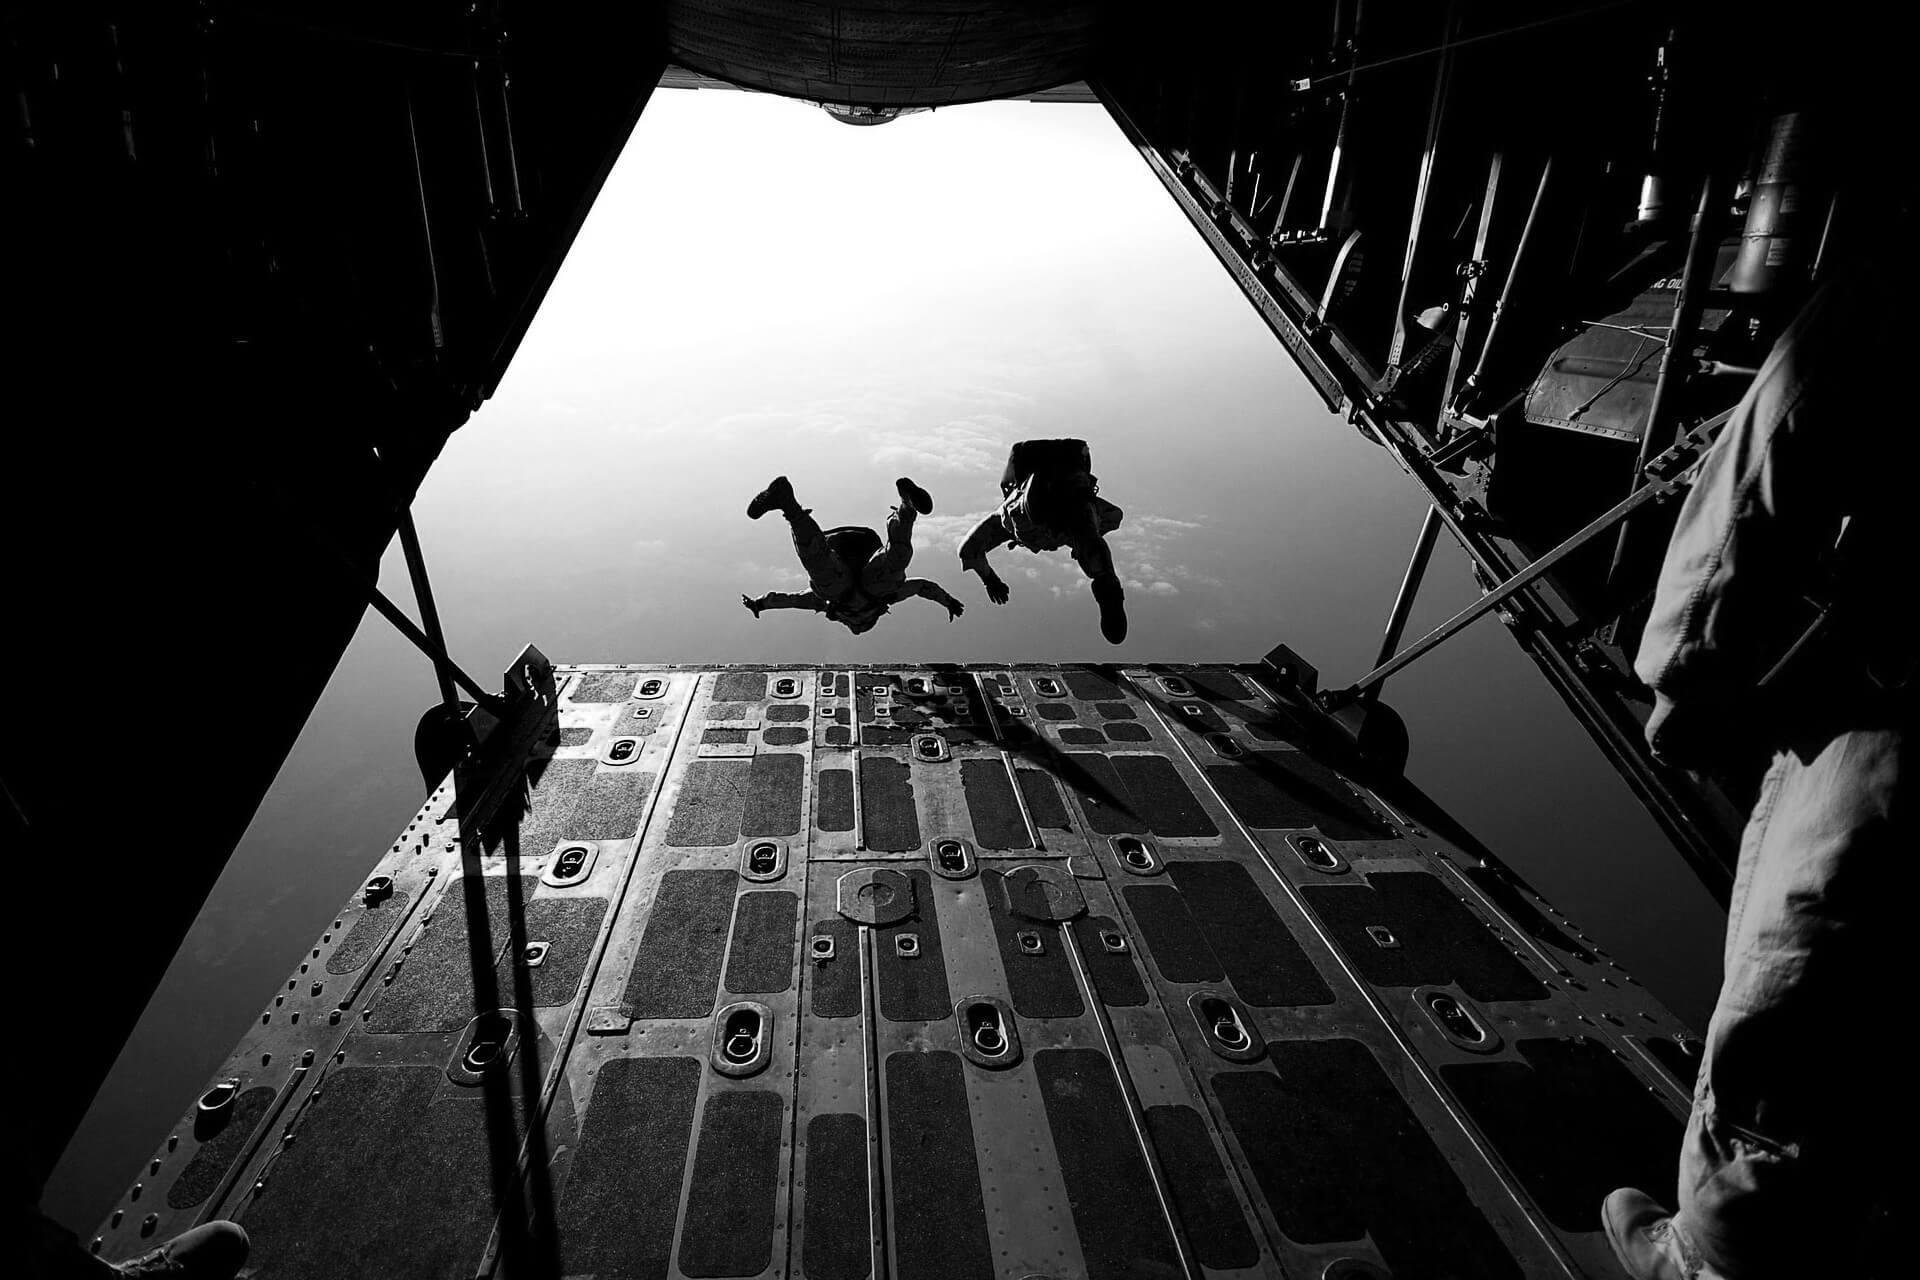 parachute-jumping-plane